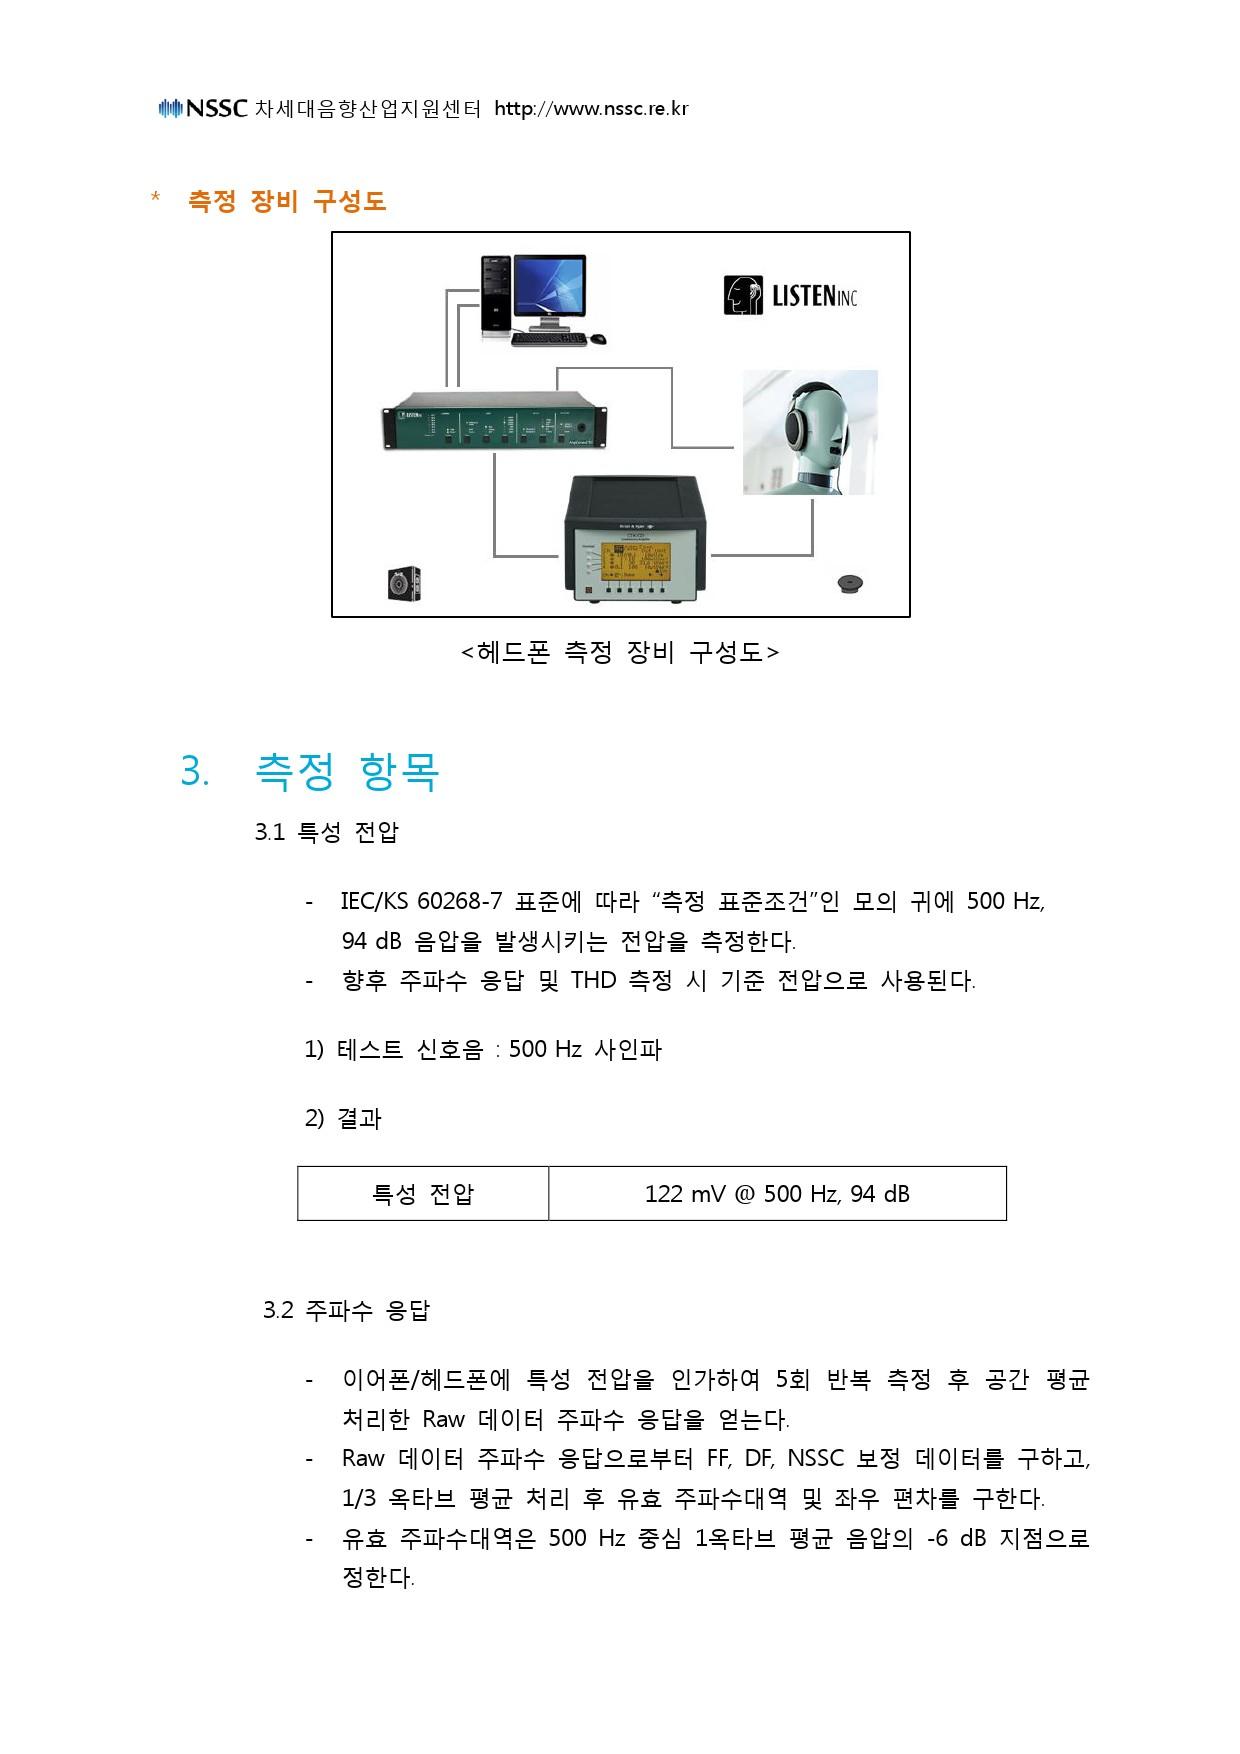 Audio-technica-MSR7-3.jpg